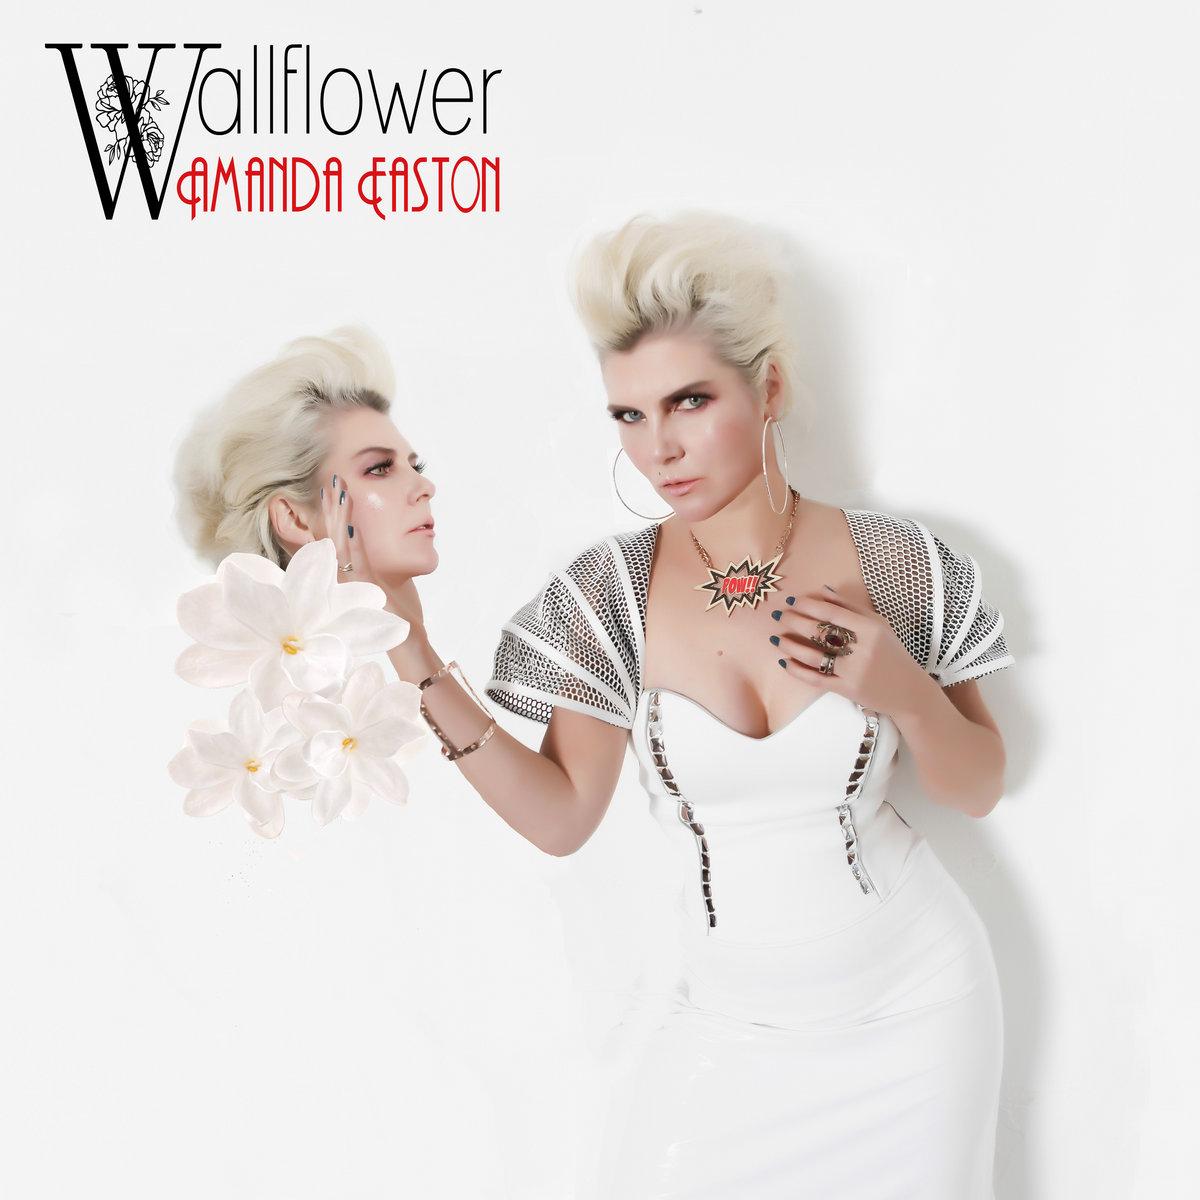 New Artist Spotlight: Amanda Easton Solidifies Her Style With New Album 'Wallflower' [Renaissance Records]